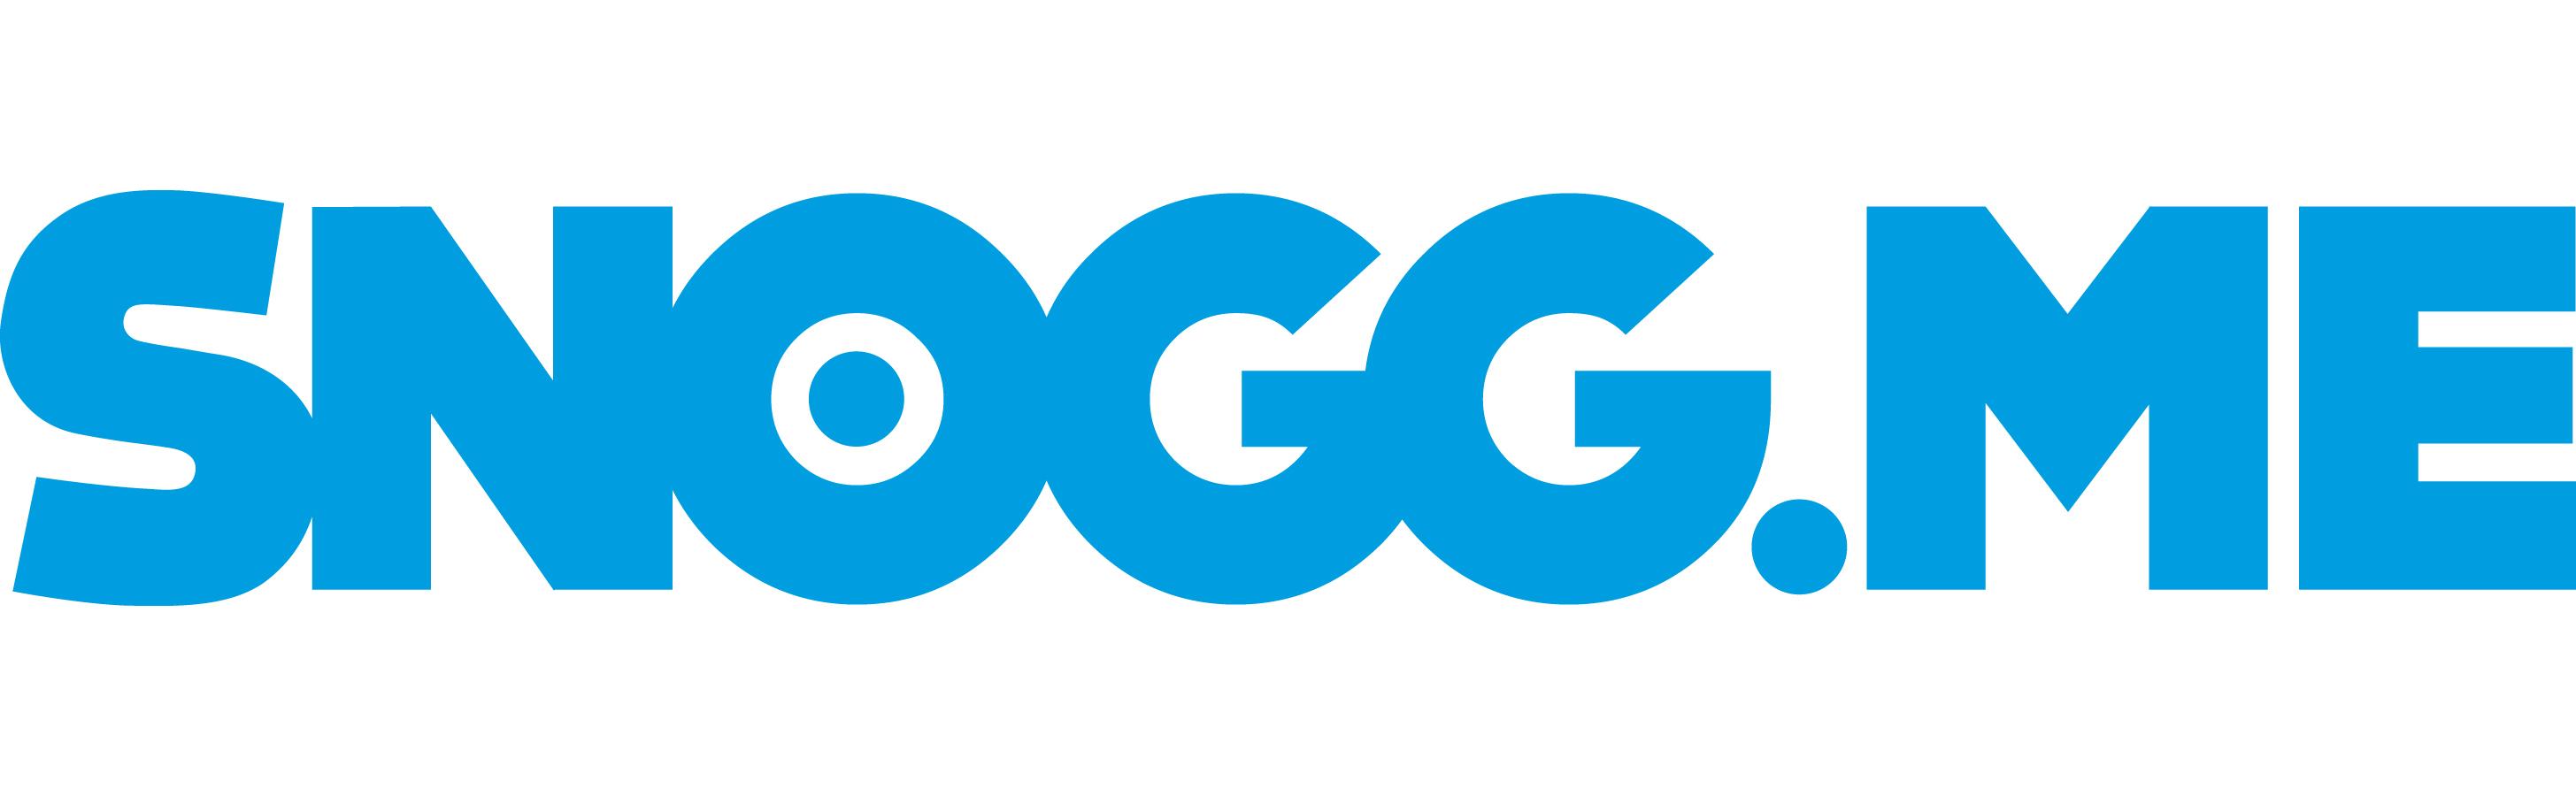 SNOGG.ME Logo